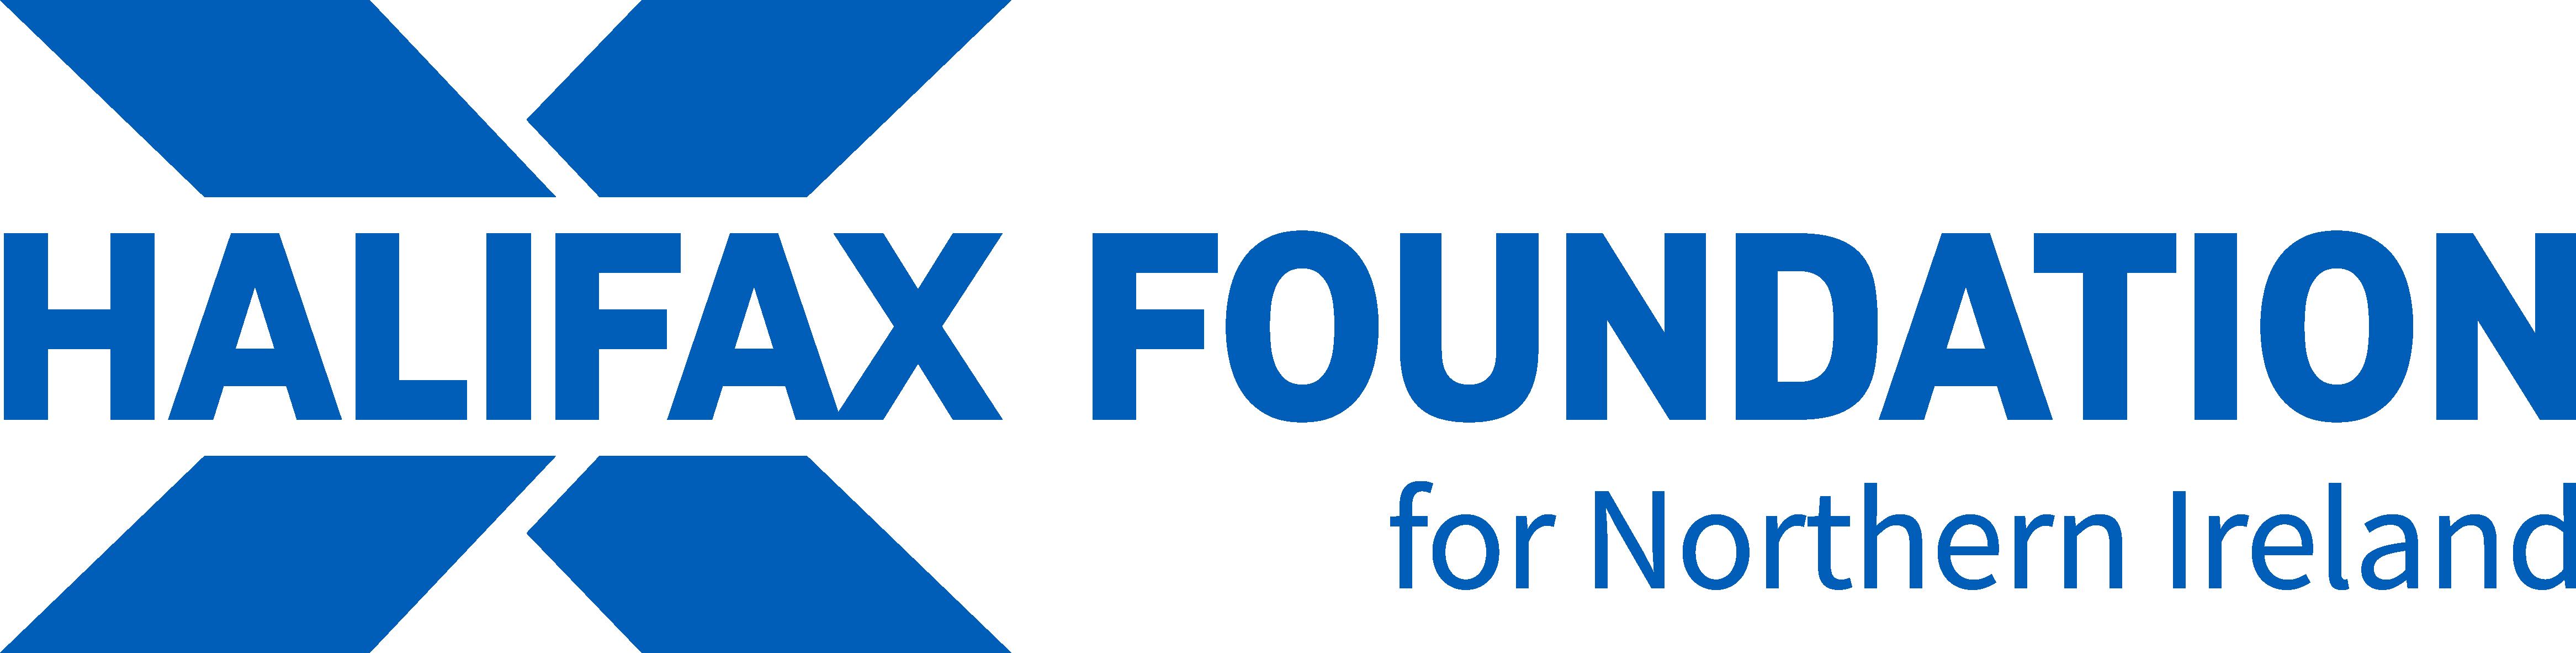 Community Grant Application Process | Halifax Foundation NI